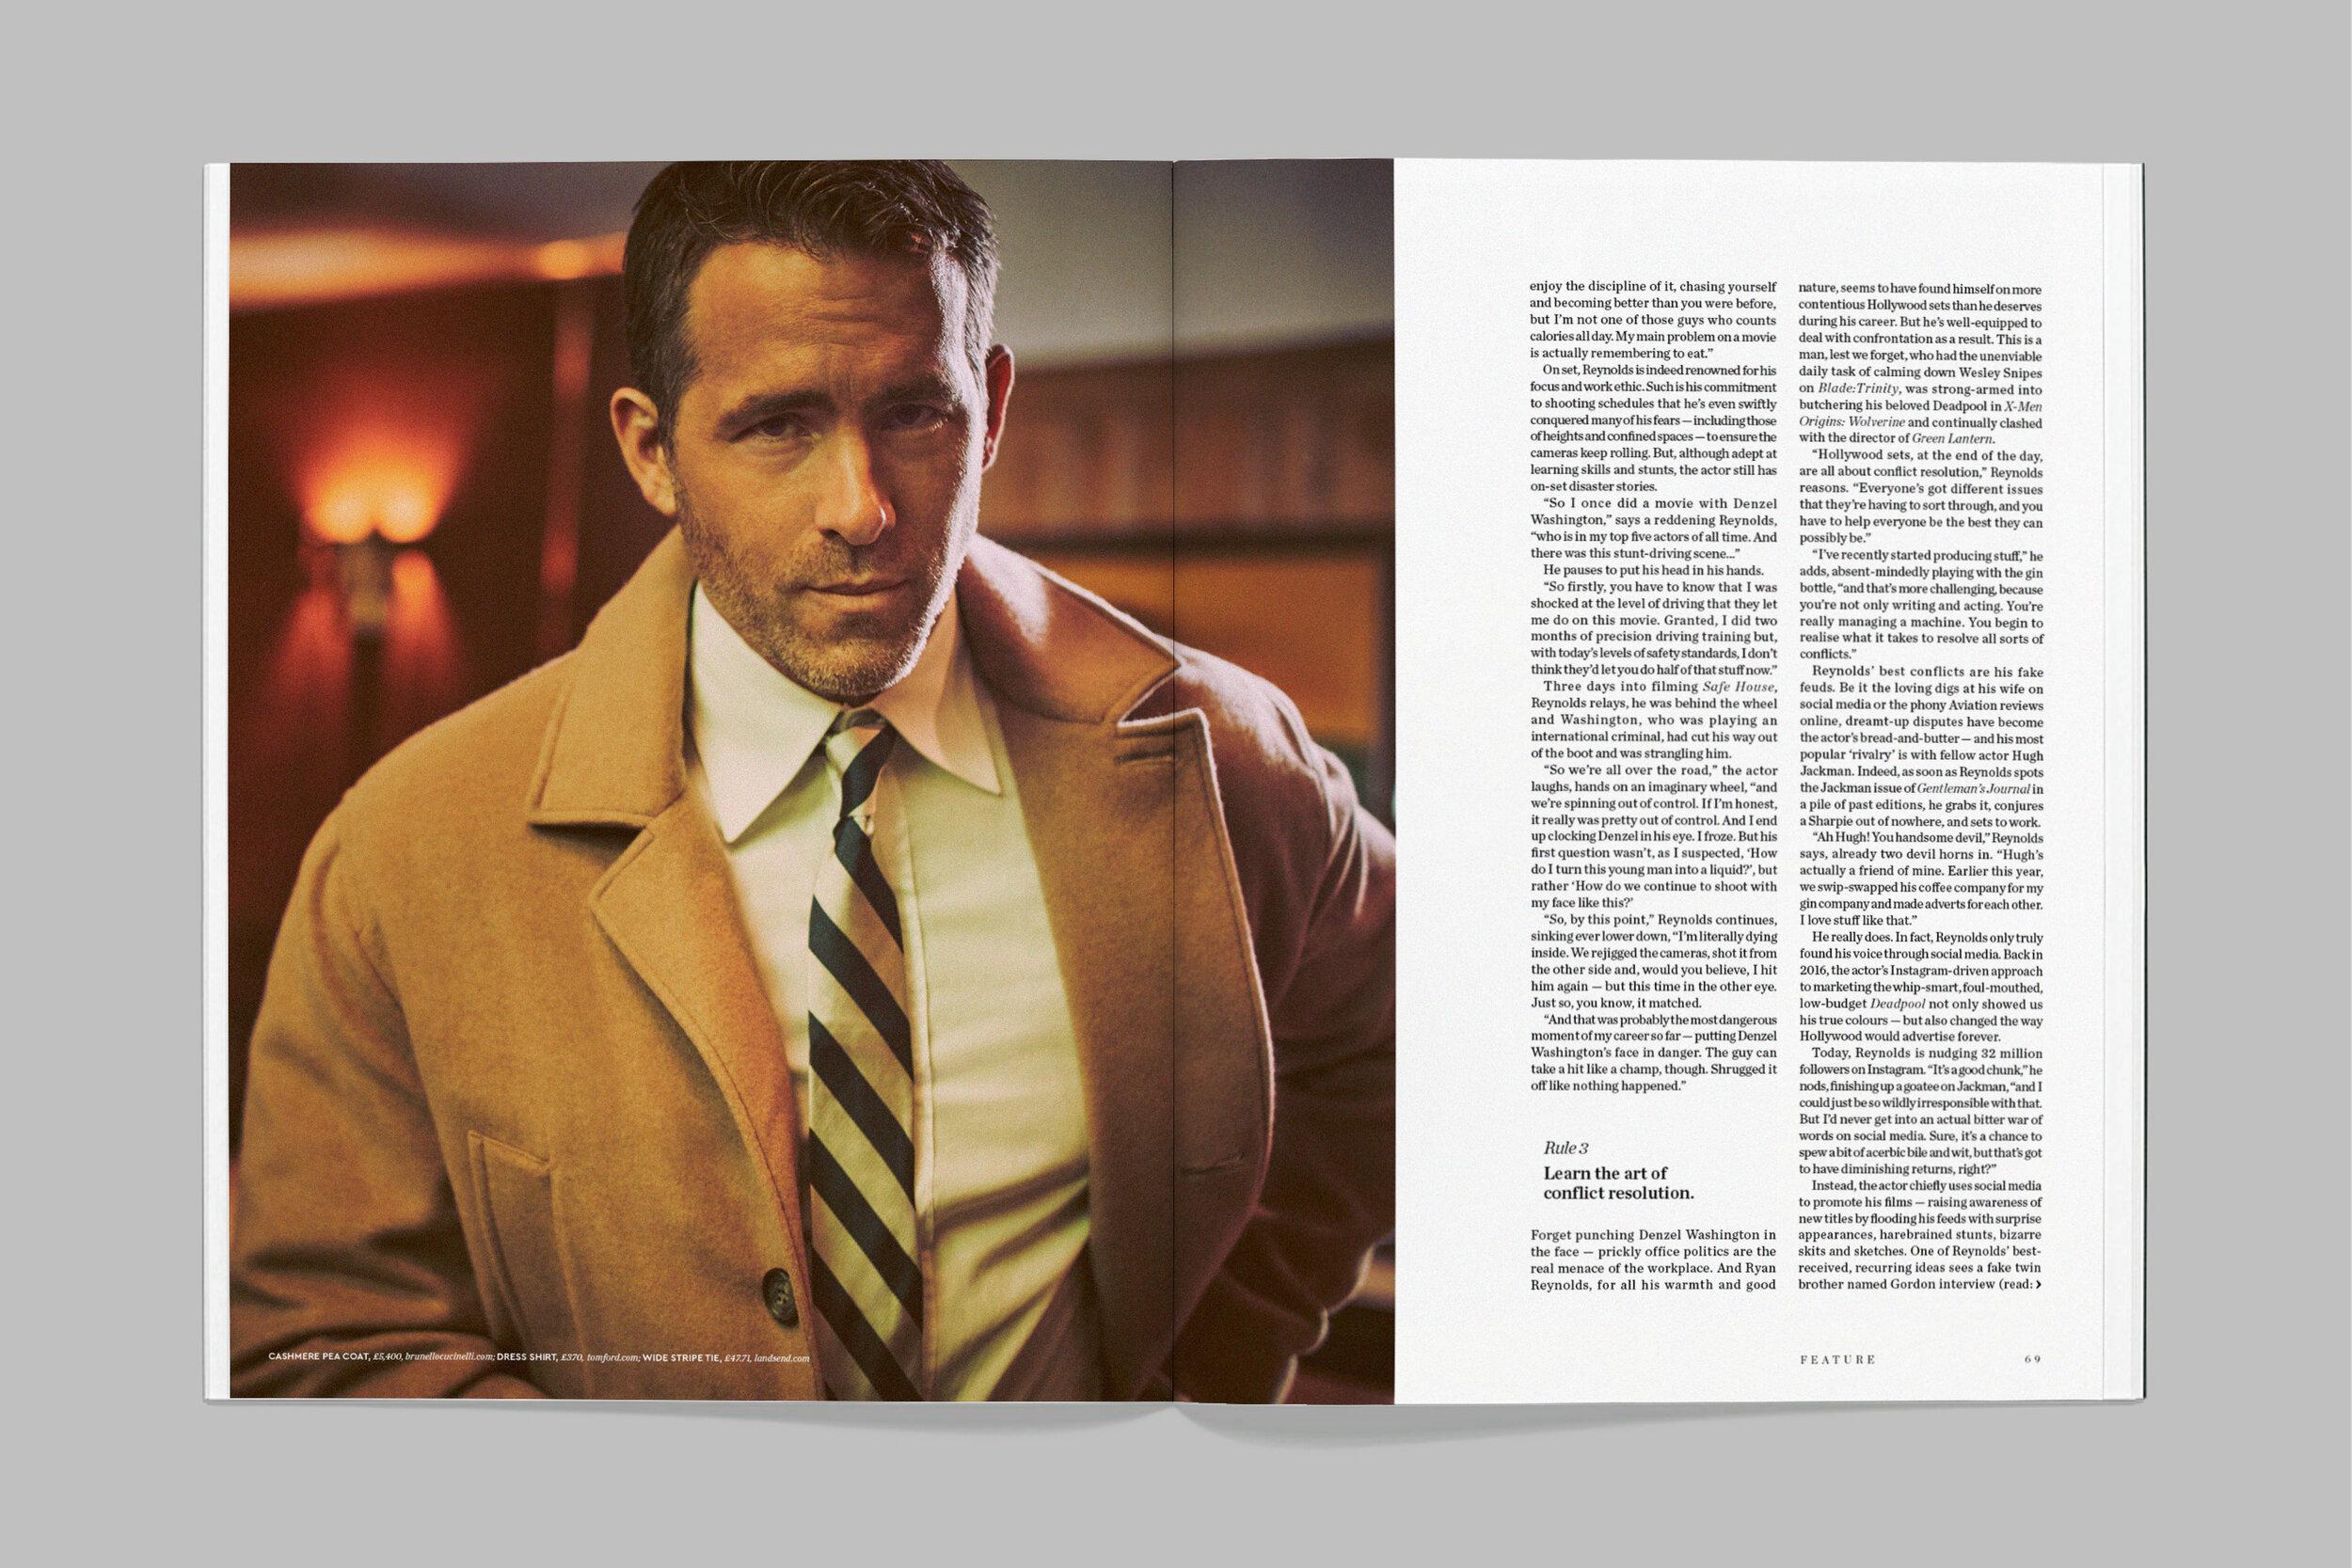 magazine_article_4.jpg